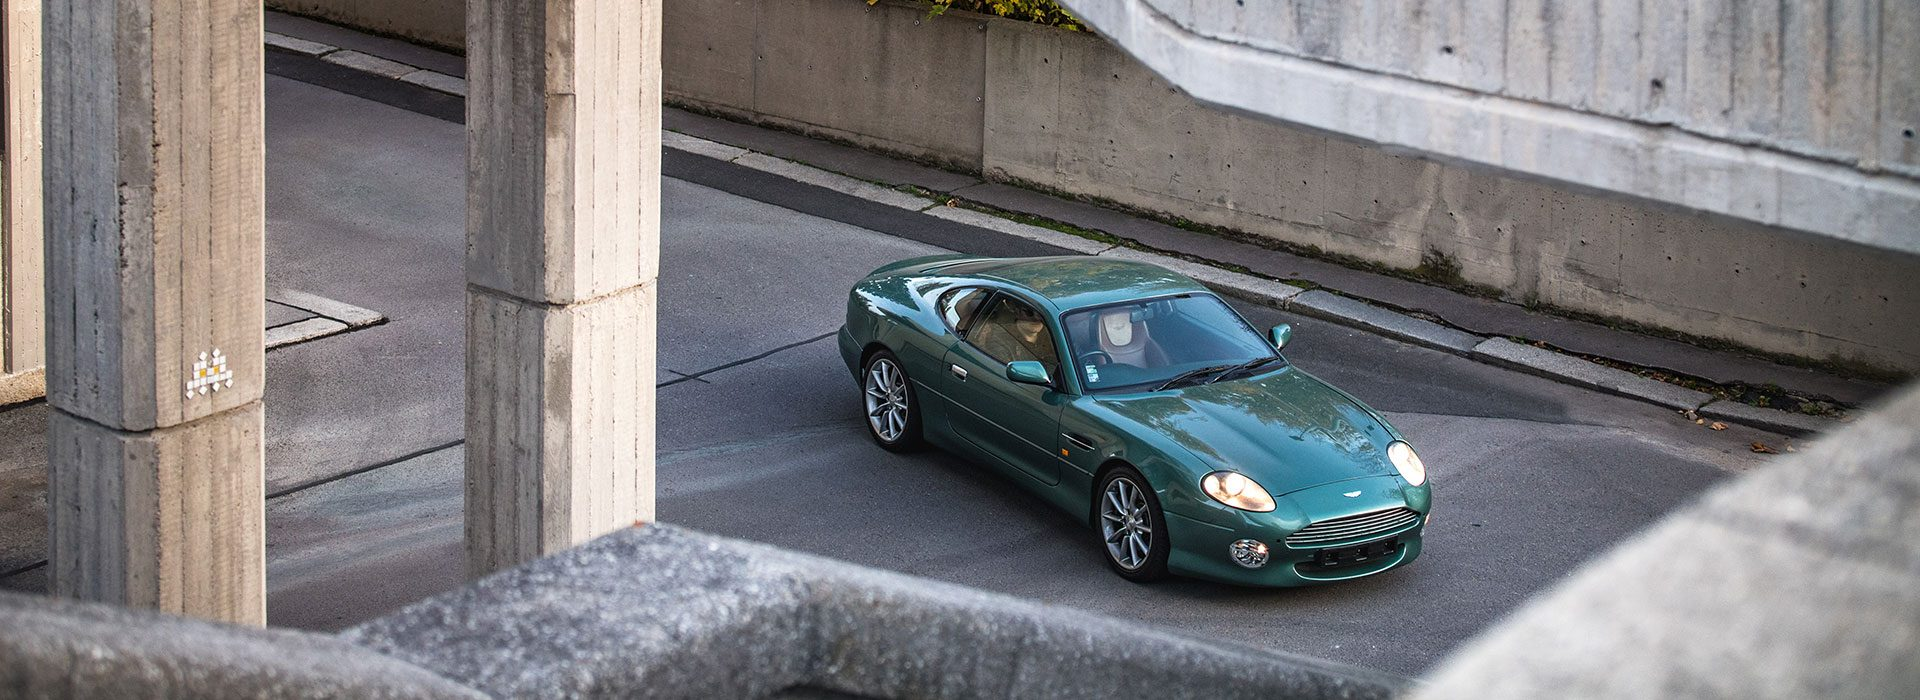 Aston Martin DB7 Vantage Prototype DP005 1998